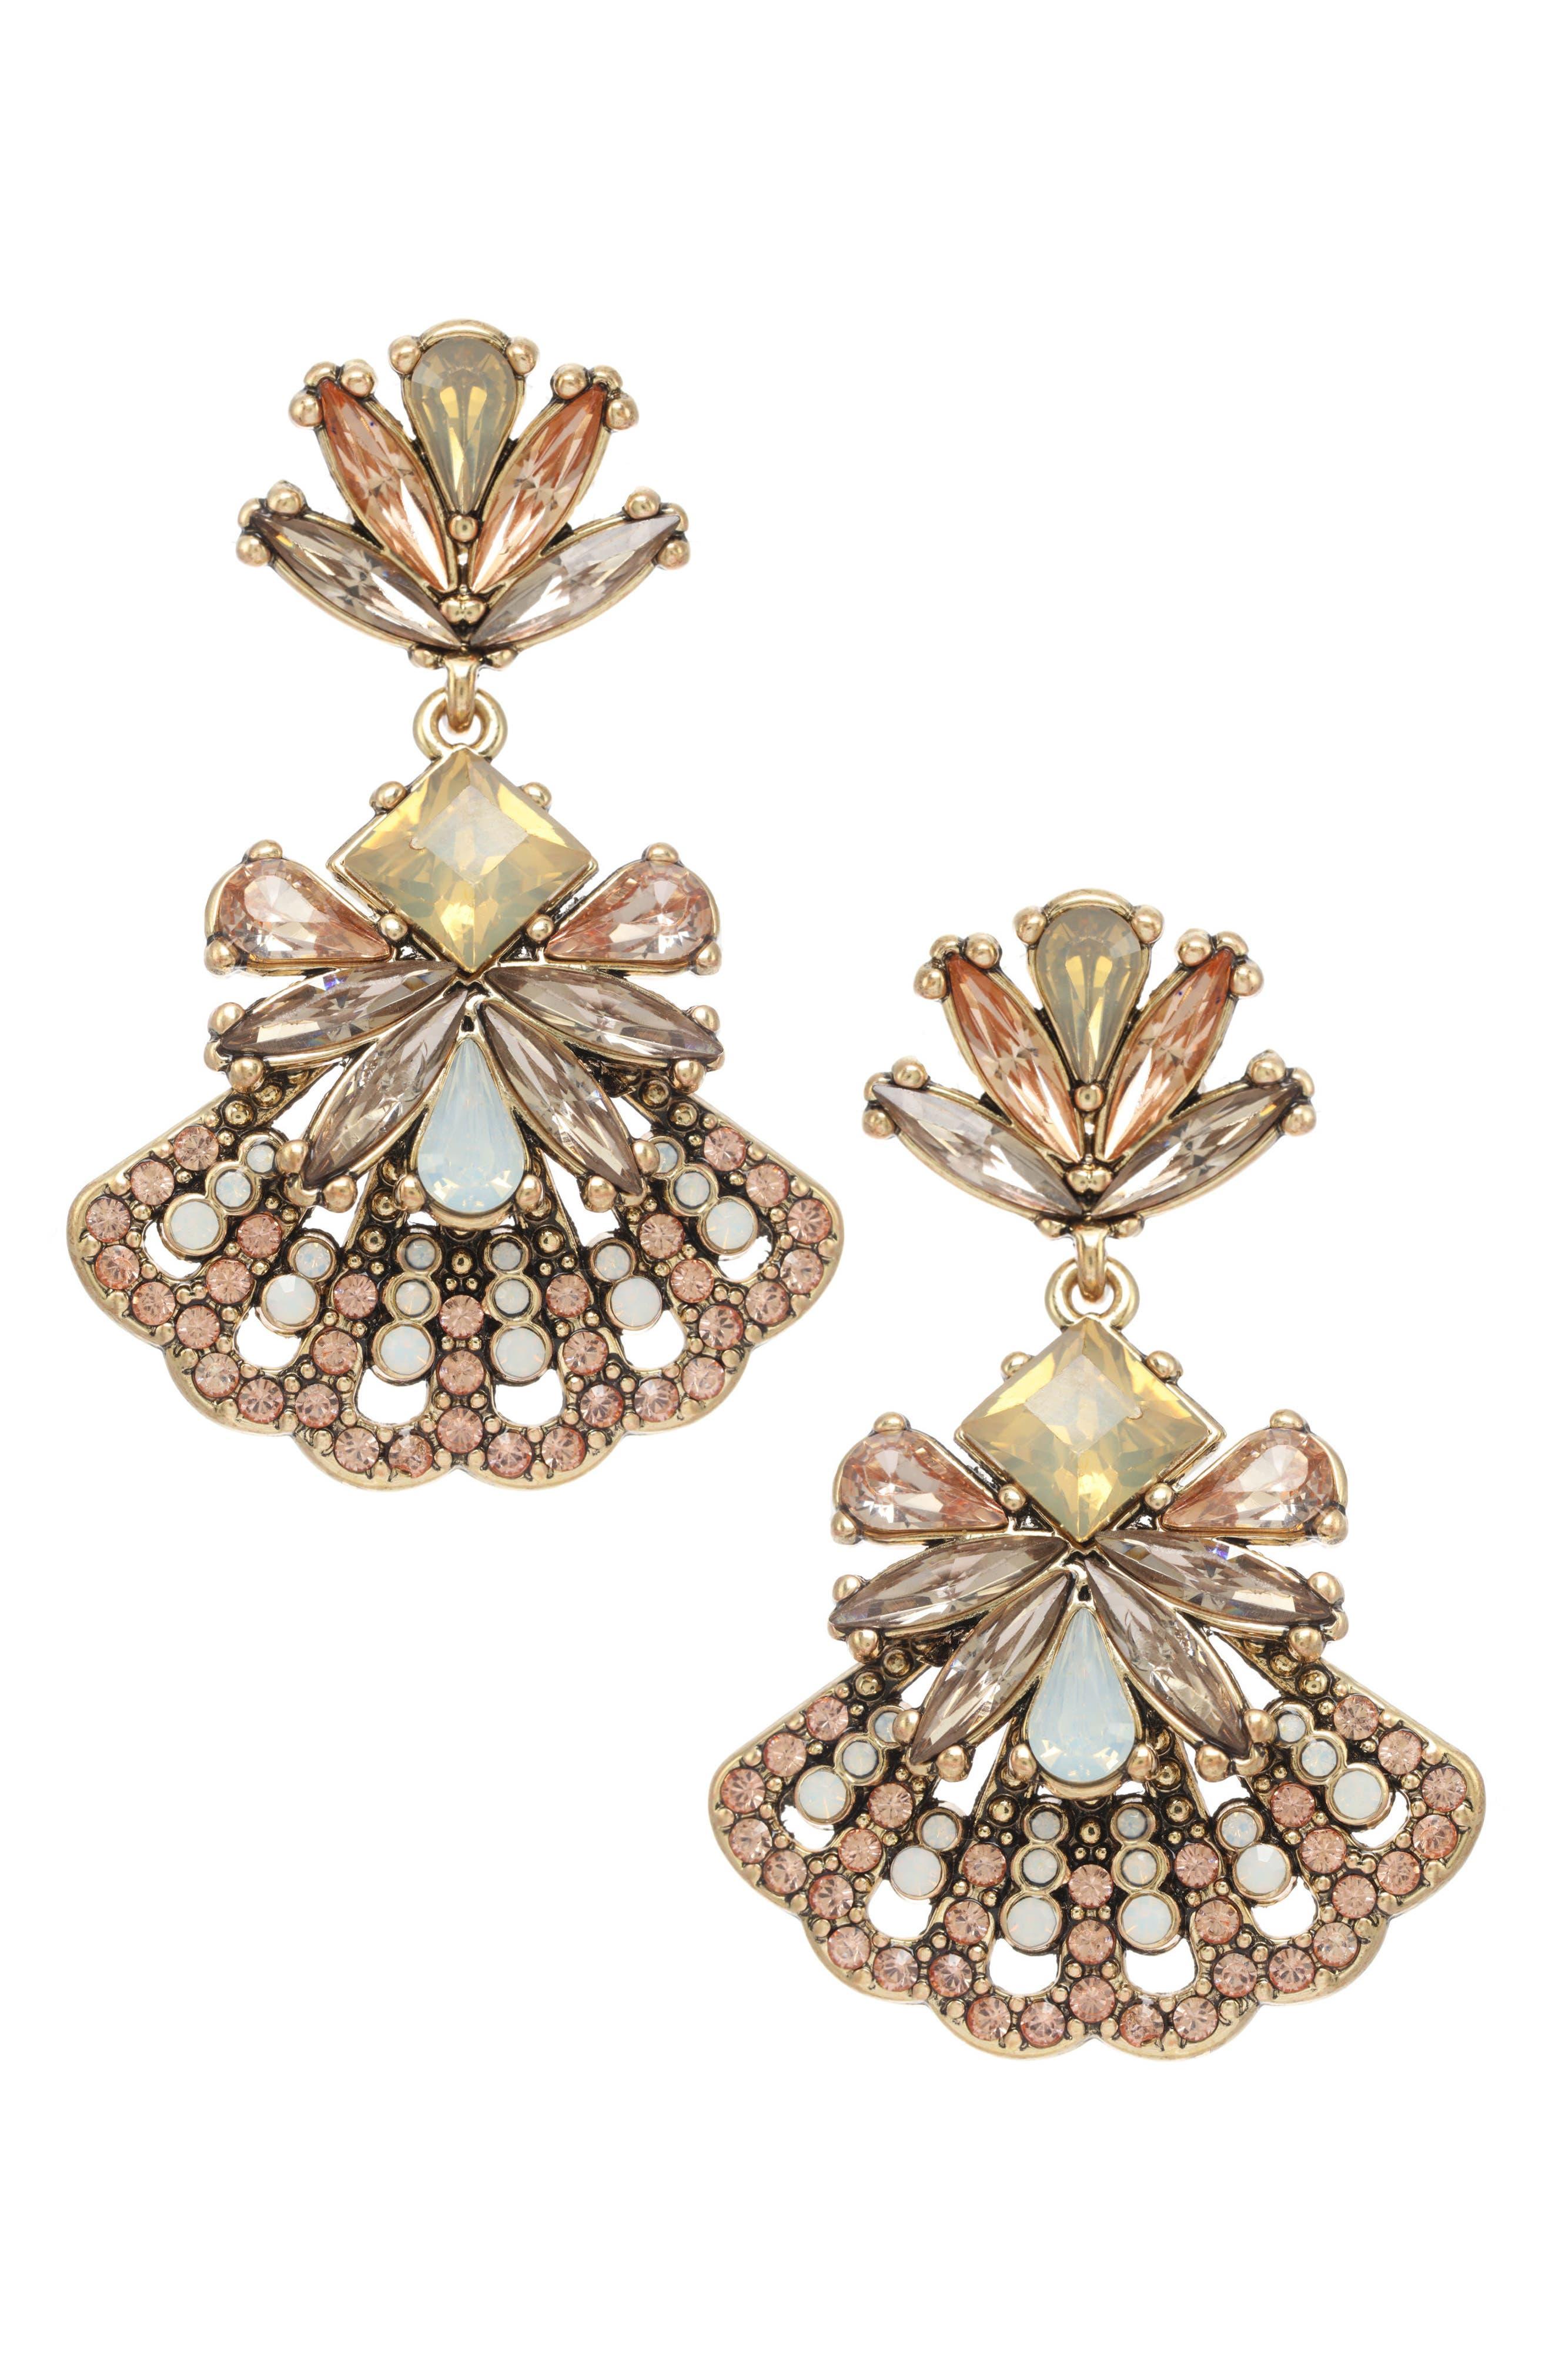 Crystal Fan Earrings,                             Main thumbnail 1, color,                             Antique Gold/ Peach